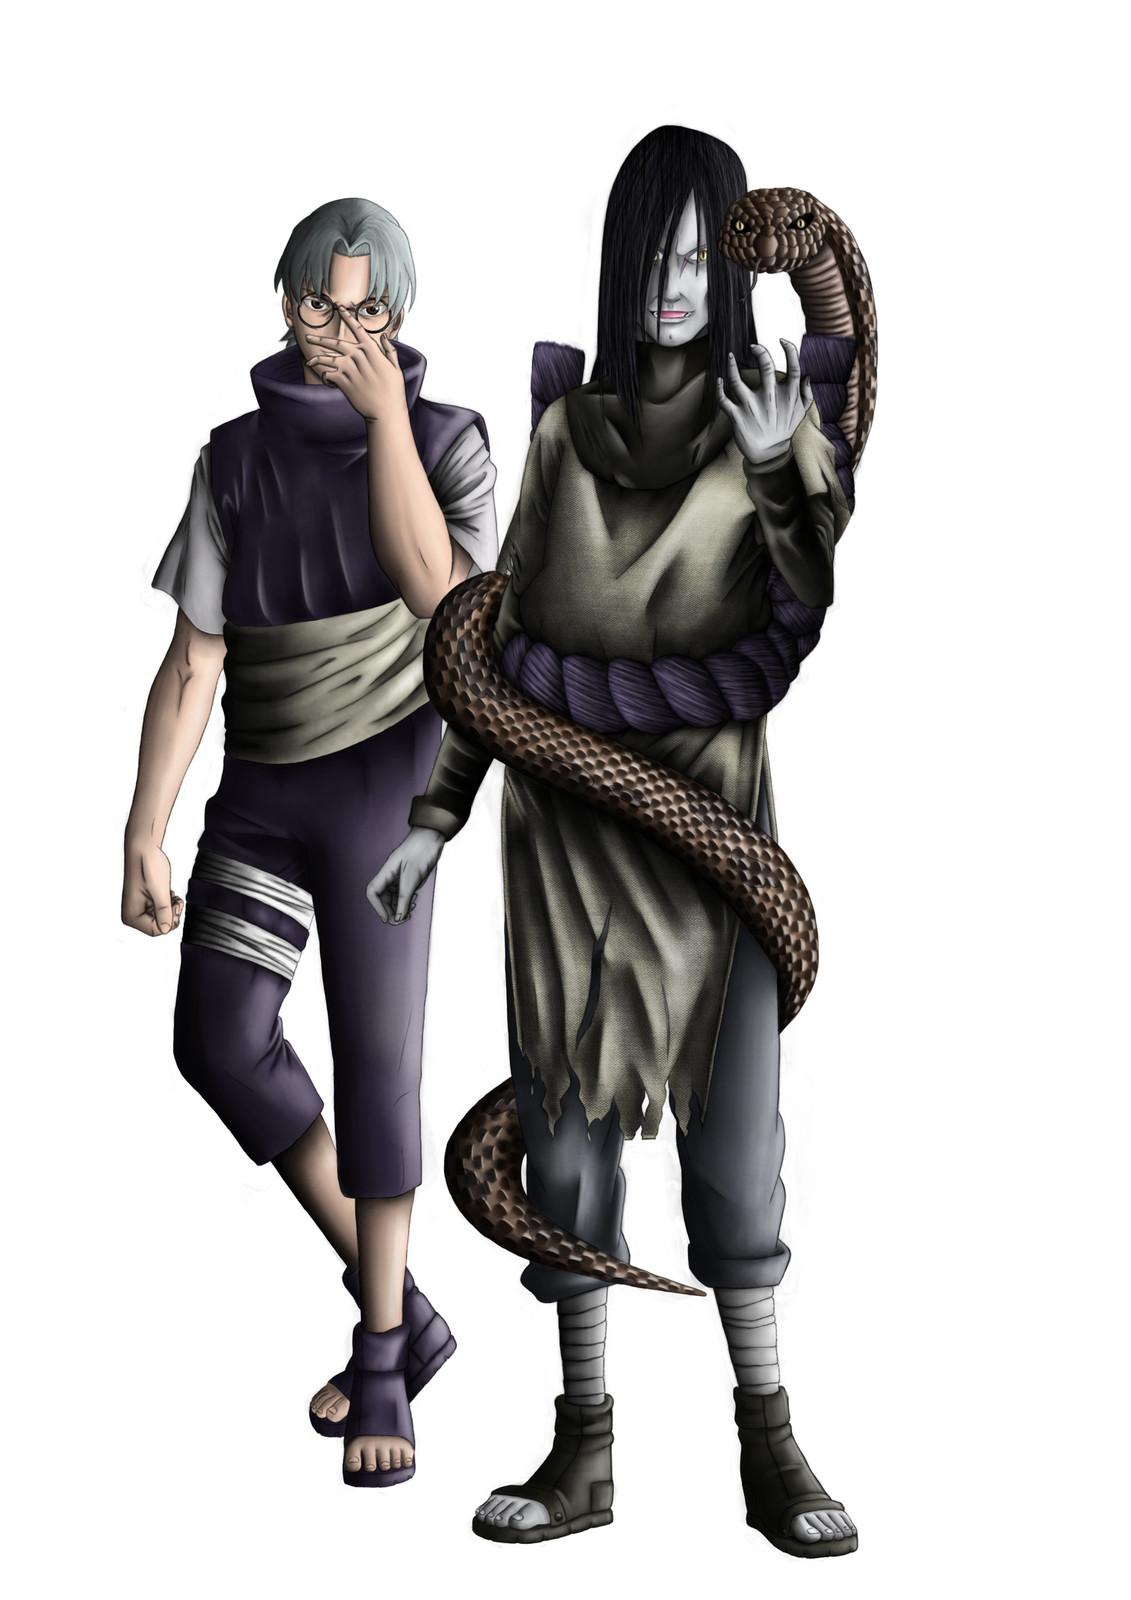 Orochimaru (Right) & Kabuto (Left)